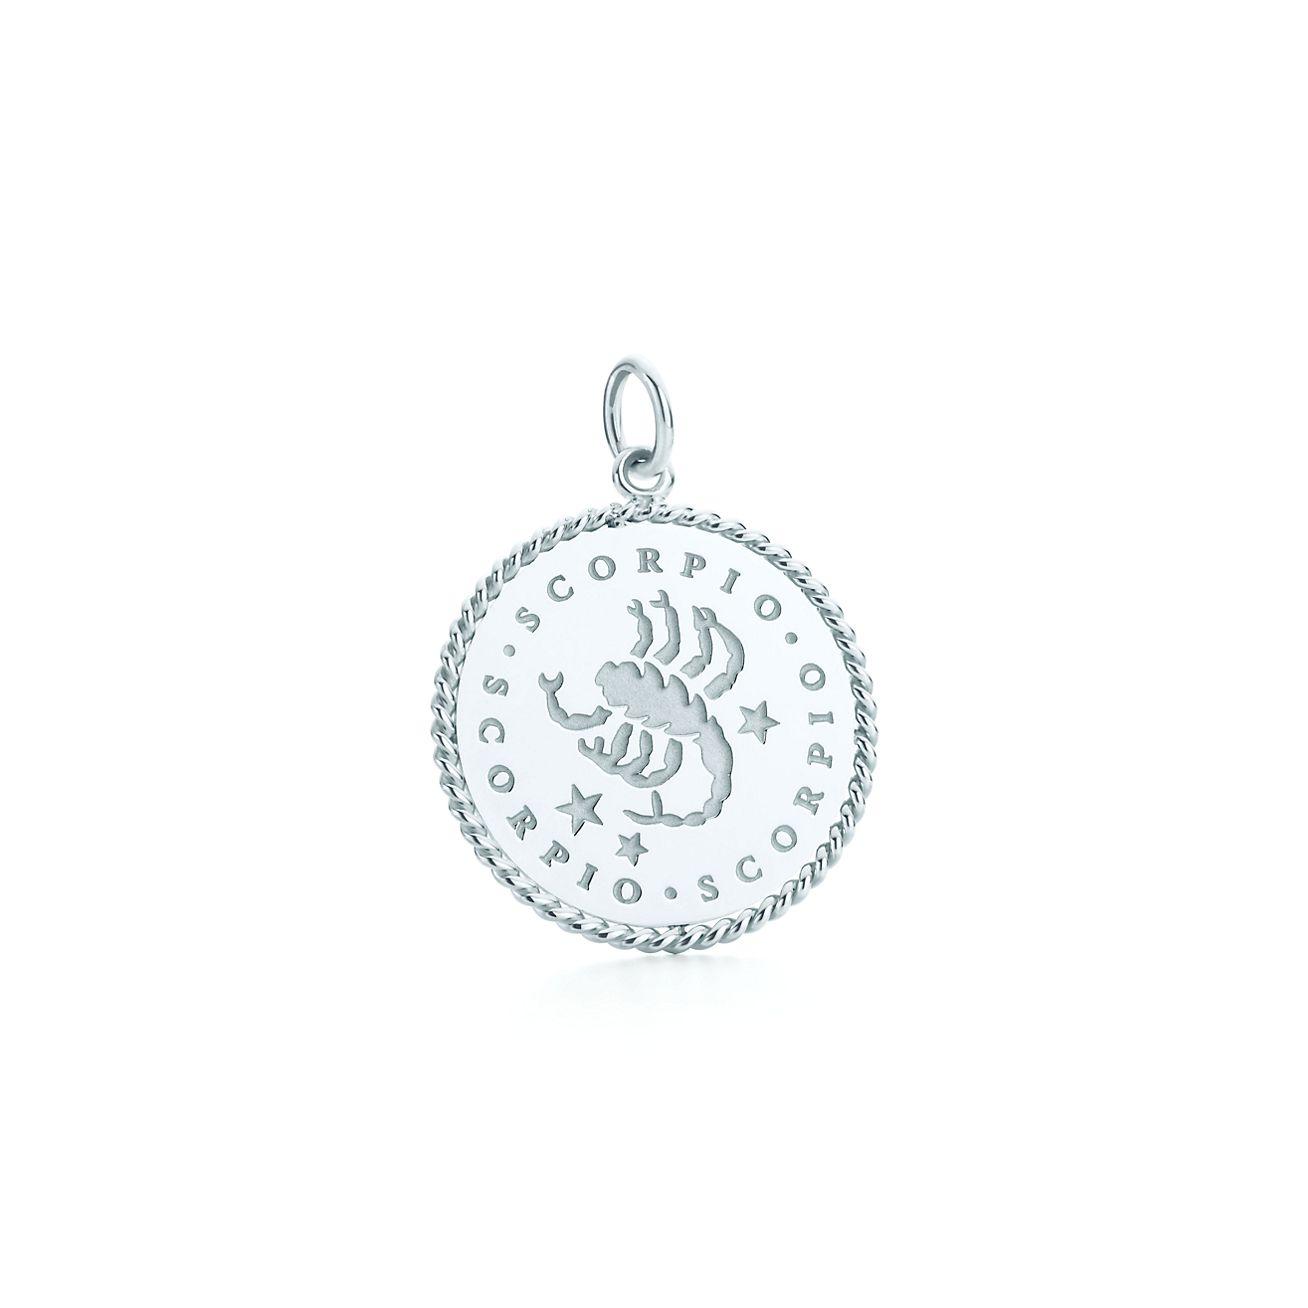 Scorpio Charme Zodiac En Argent - Taille Scorpio Tiffany & Co. Jq52sZcDc